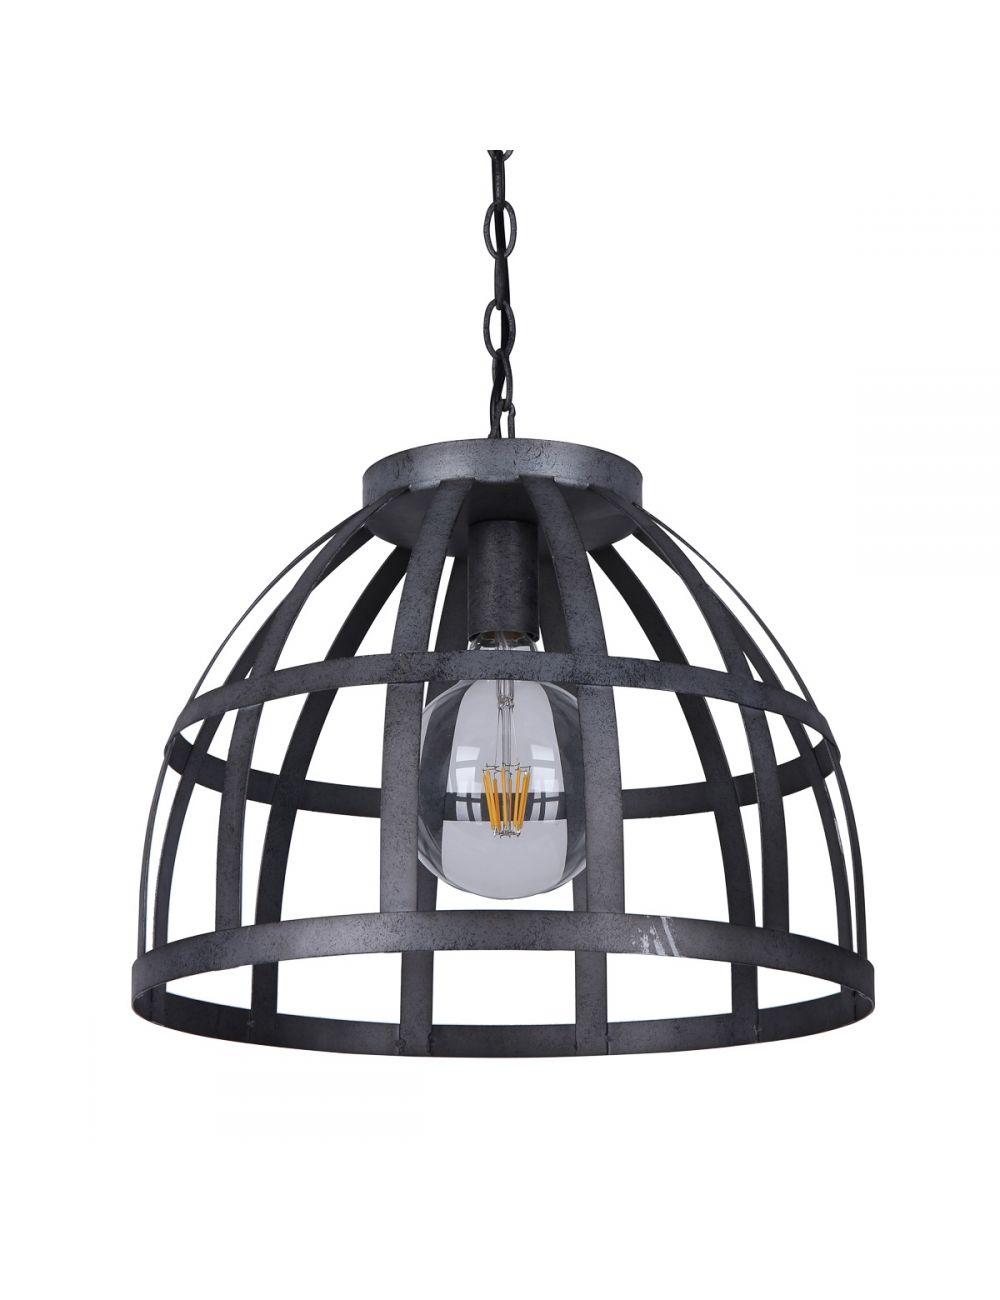 Lampa wisząca pojedyncza metalowa kuta Calera Italux PND-4014-47-1